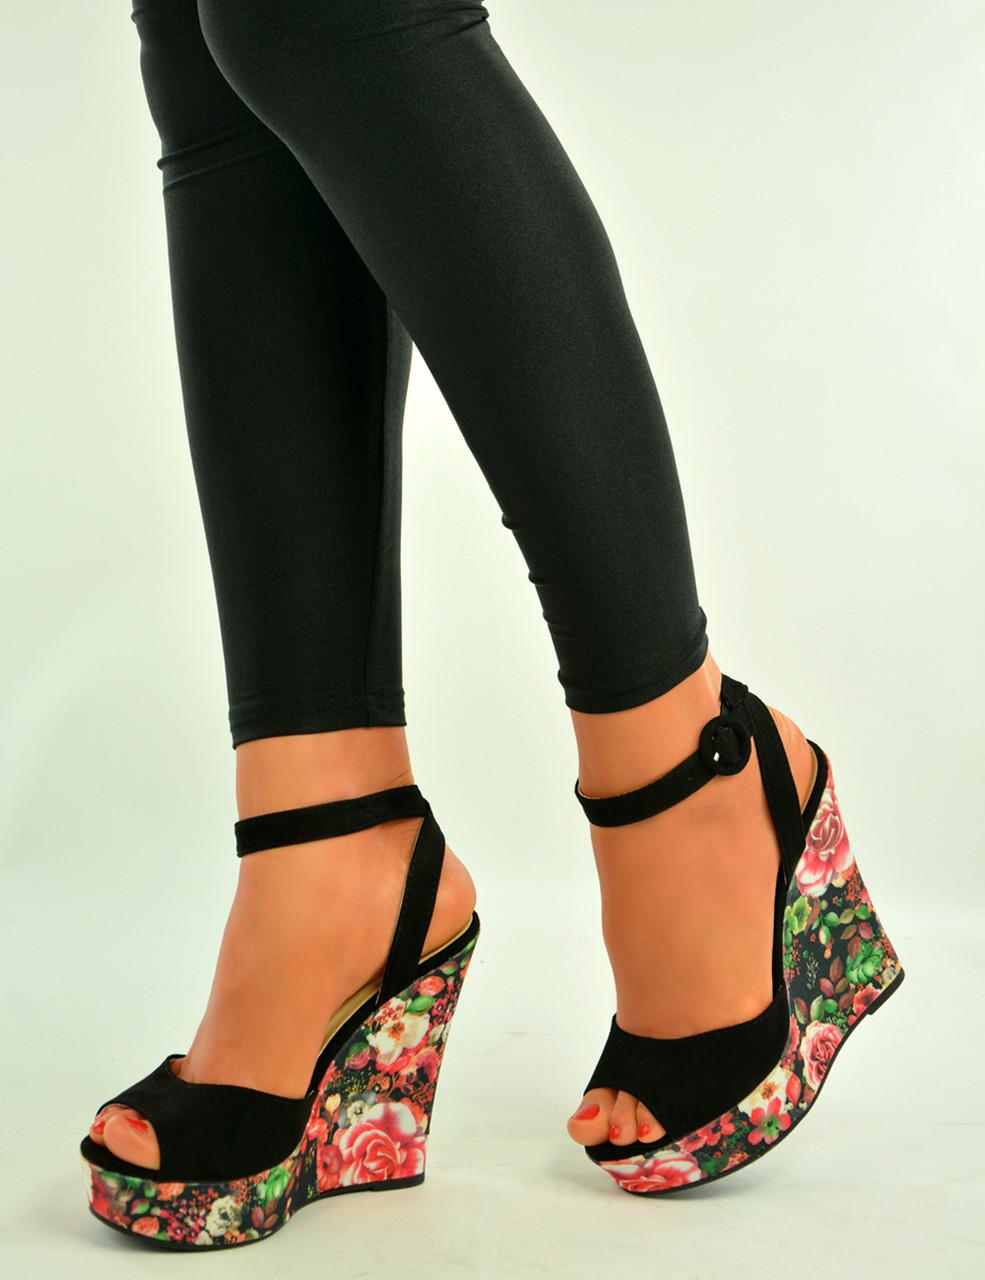 300544cd8314 Brand New Womens Ladies Black Floral Print Wedges Platform Sandals Shoes  Size Uk 3-8